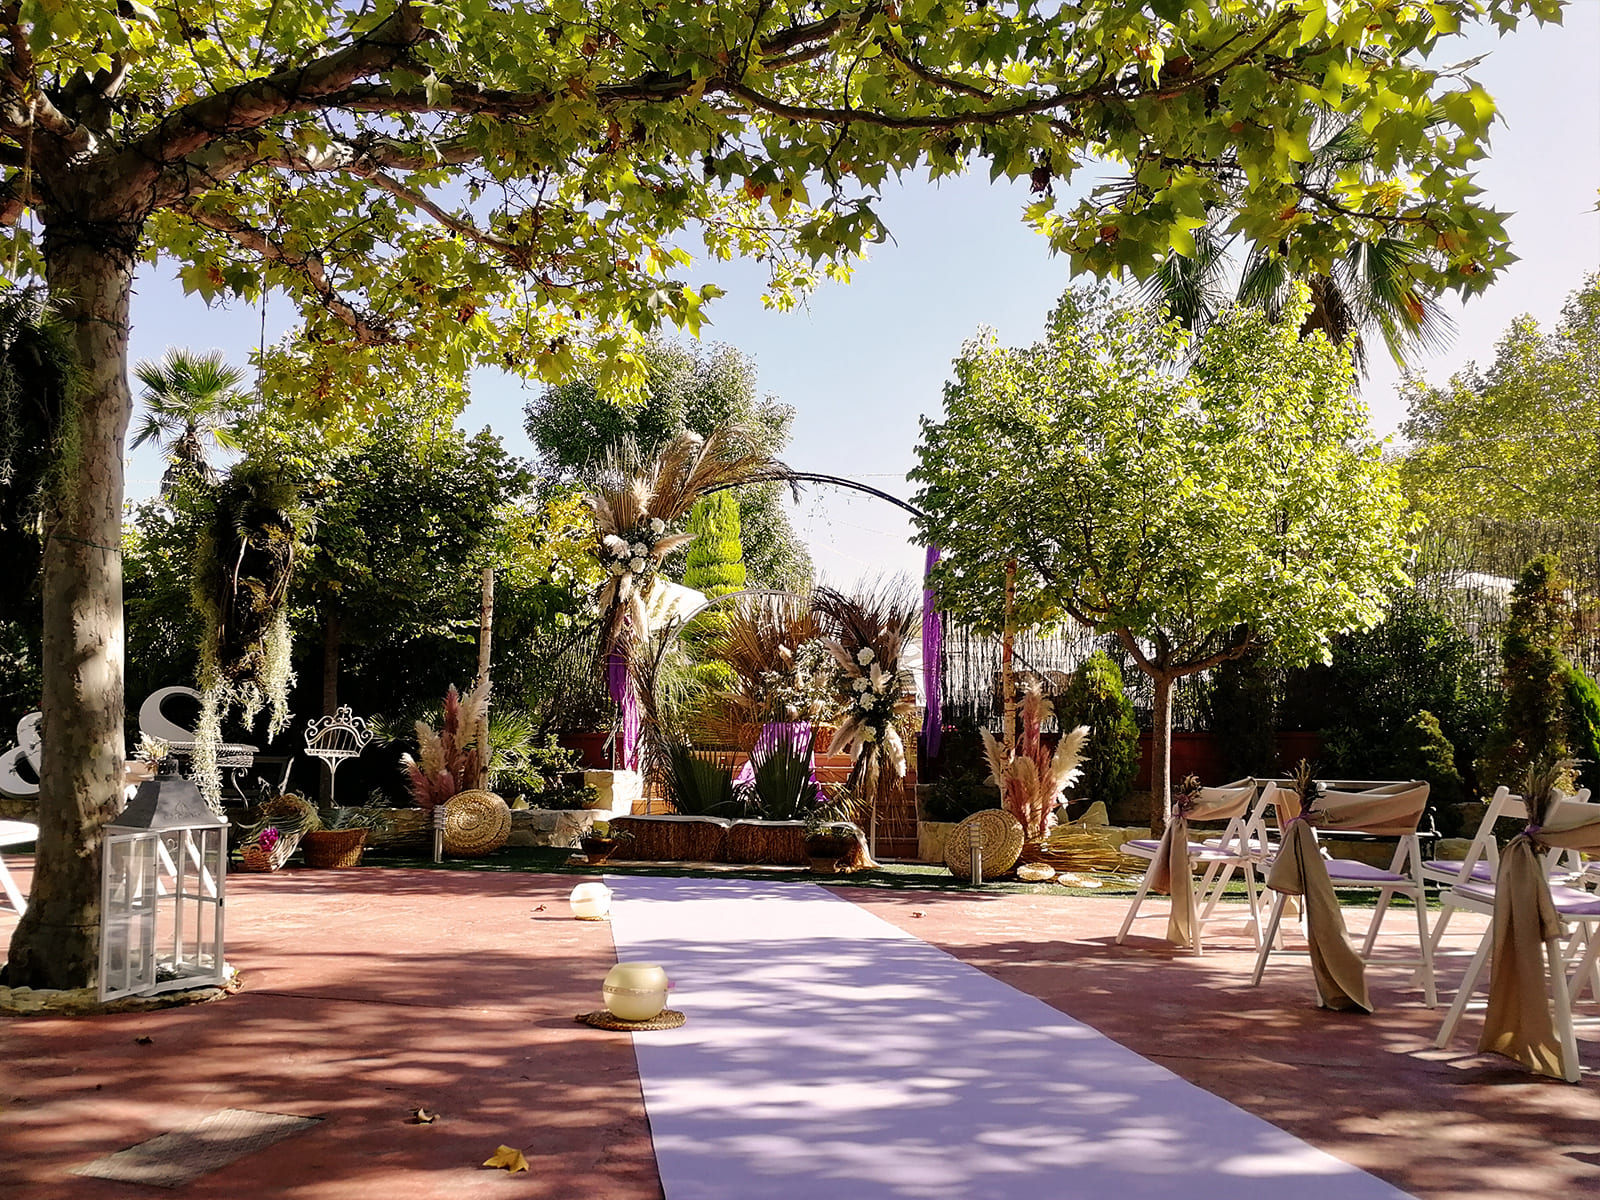 boda-civil-rupestre-personalizada-tonos-morados-SJ-02_HIDROJARDIN-Bañeres